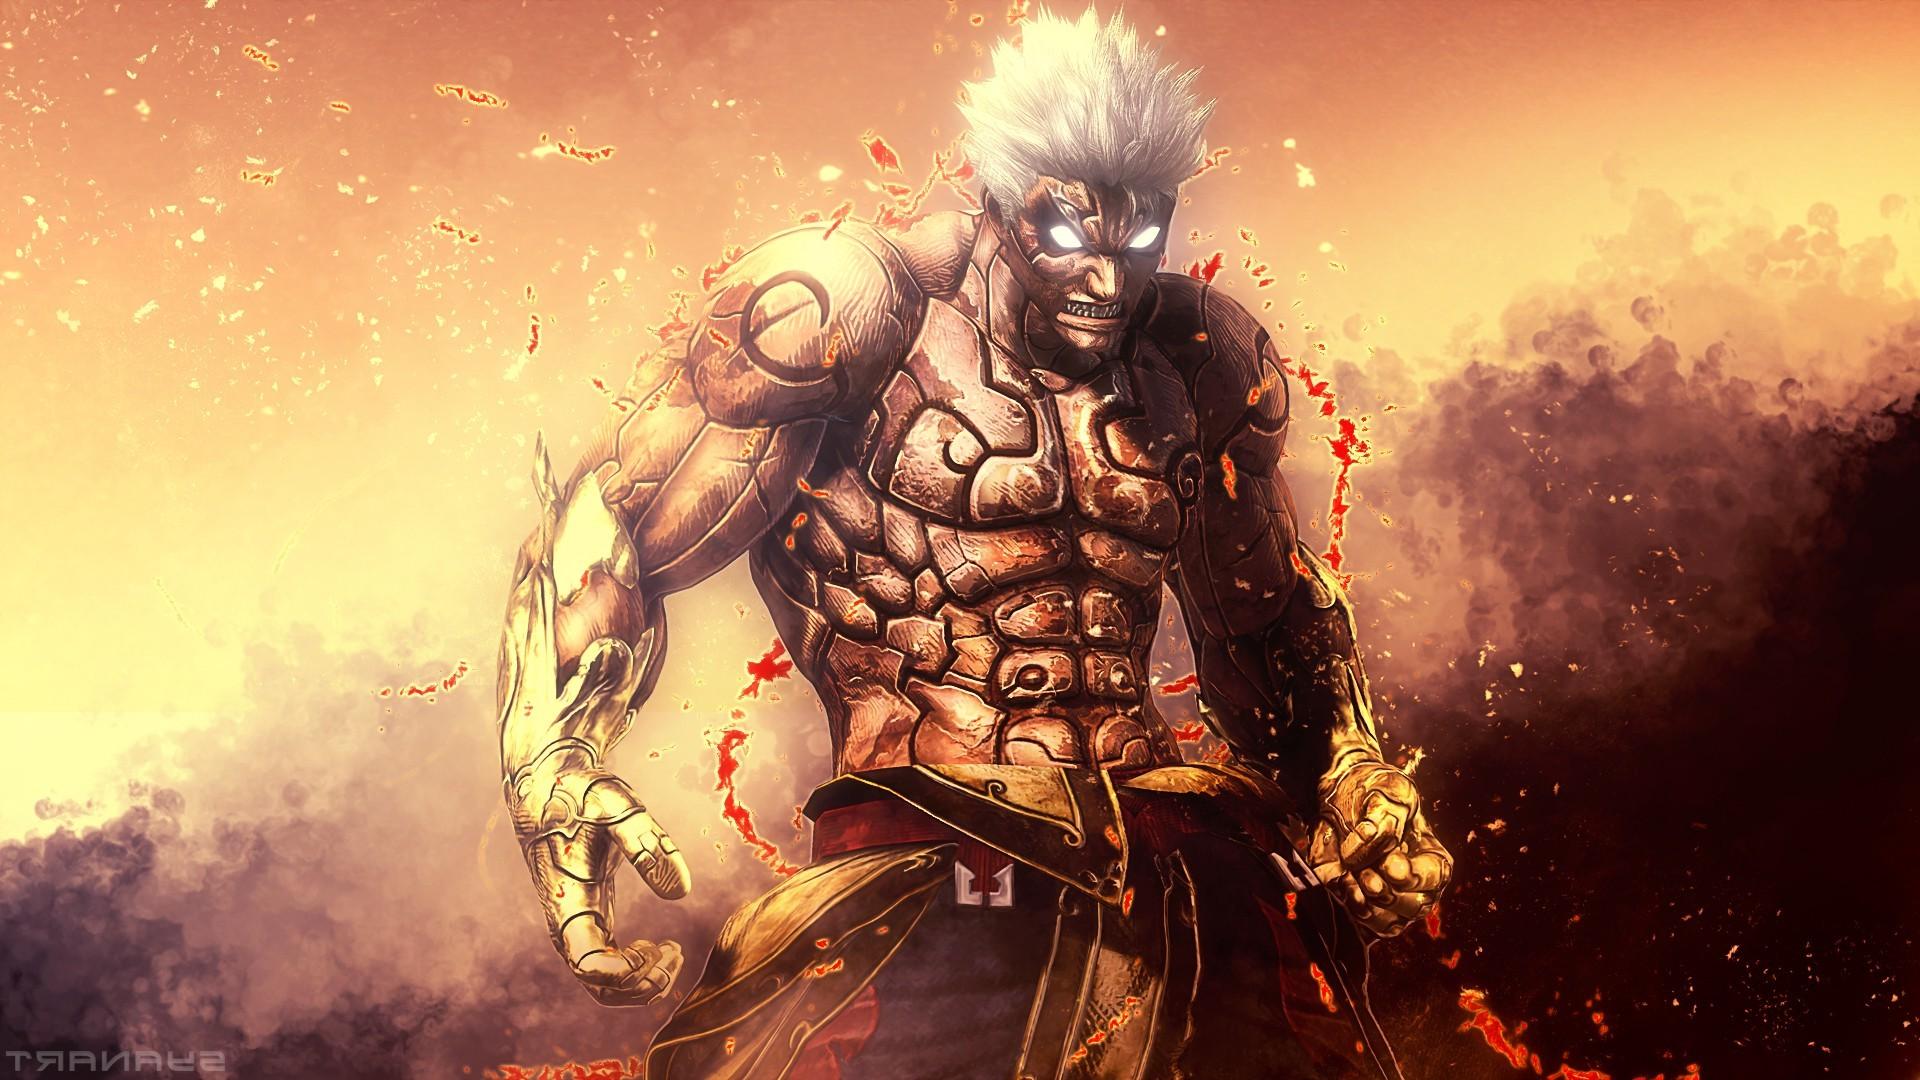 video Games Asuras Wrath Fantasy Art Concept Art Wallpapers HD 1920x1080